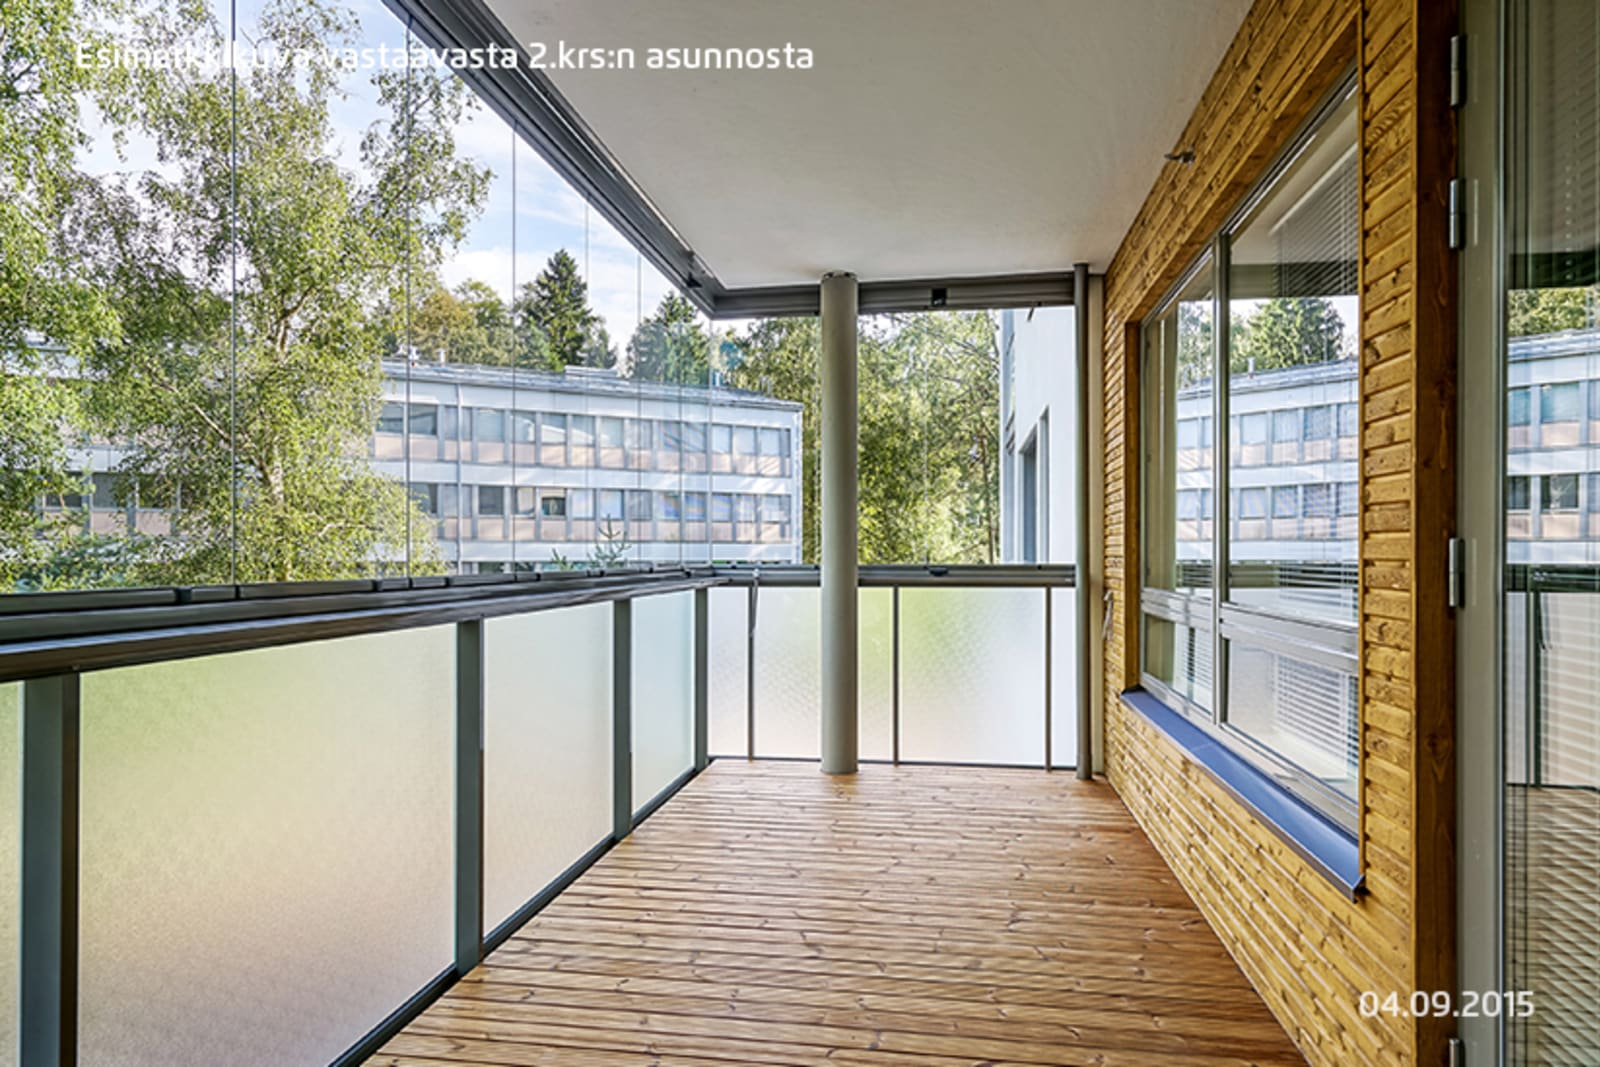 Espoo, Tapiola, Neulaspolku 2 B 010